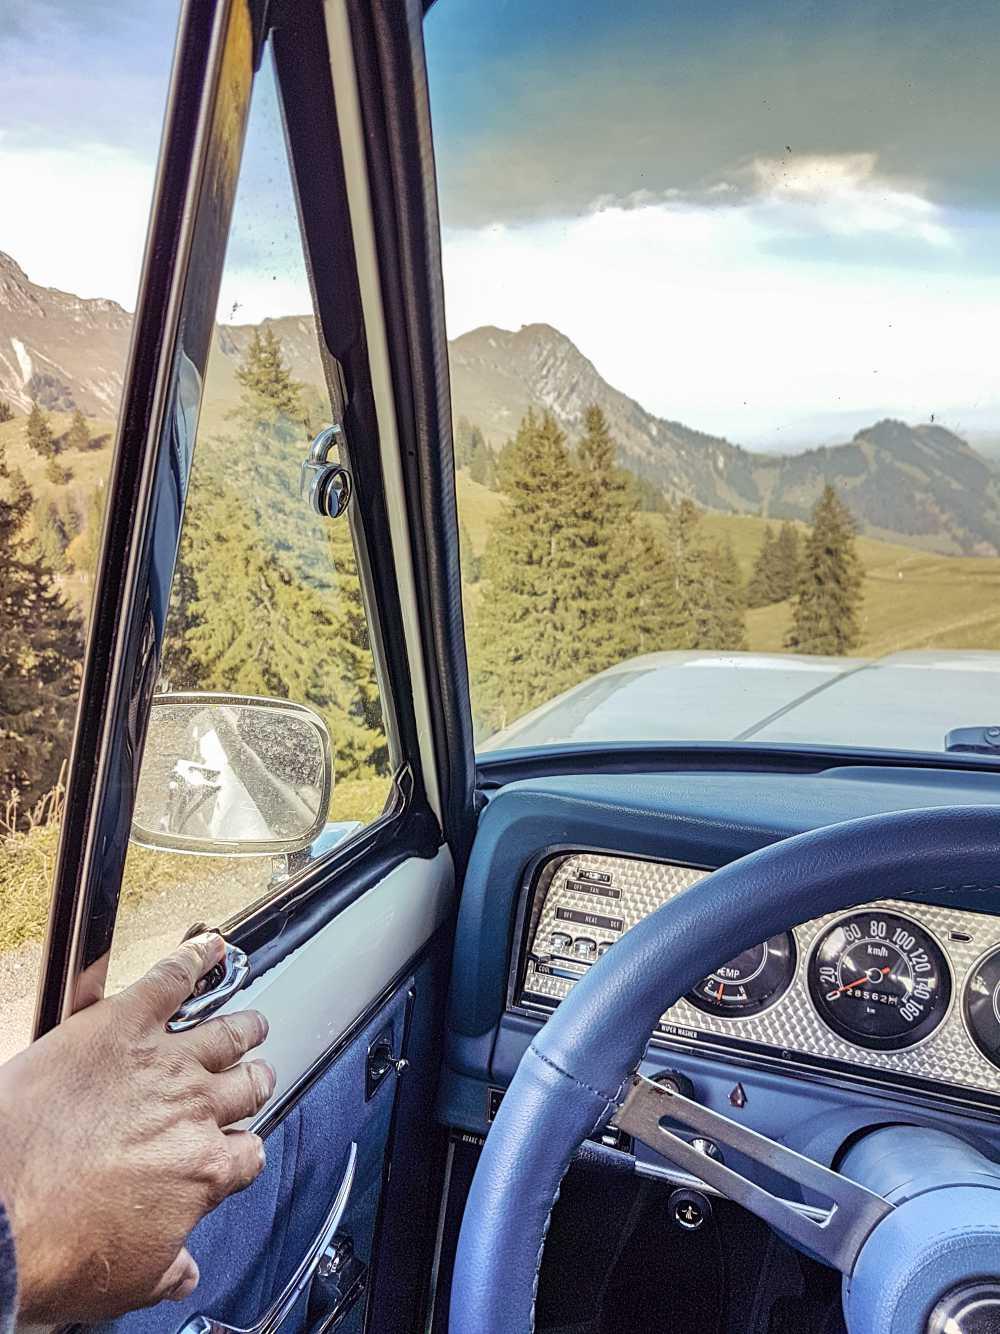 jeep-cherokee-chief-1978-shooting-moleson-13